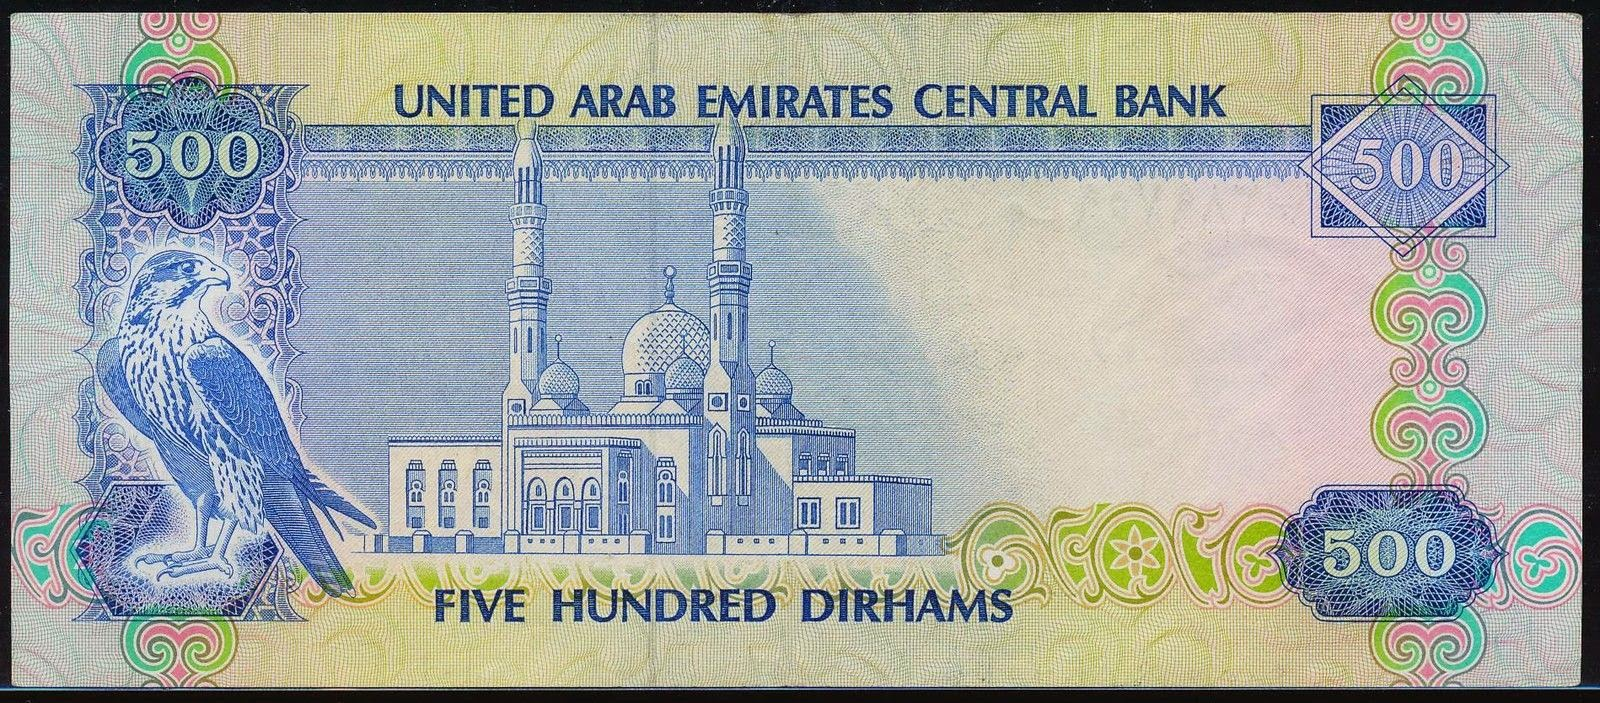 United Arab Emirates Currency Money 500 Dirhams banknote 1983 Jumeirah Mosque in Dubai